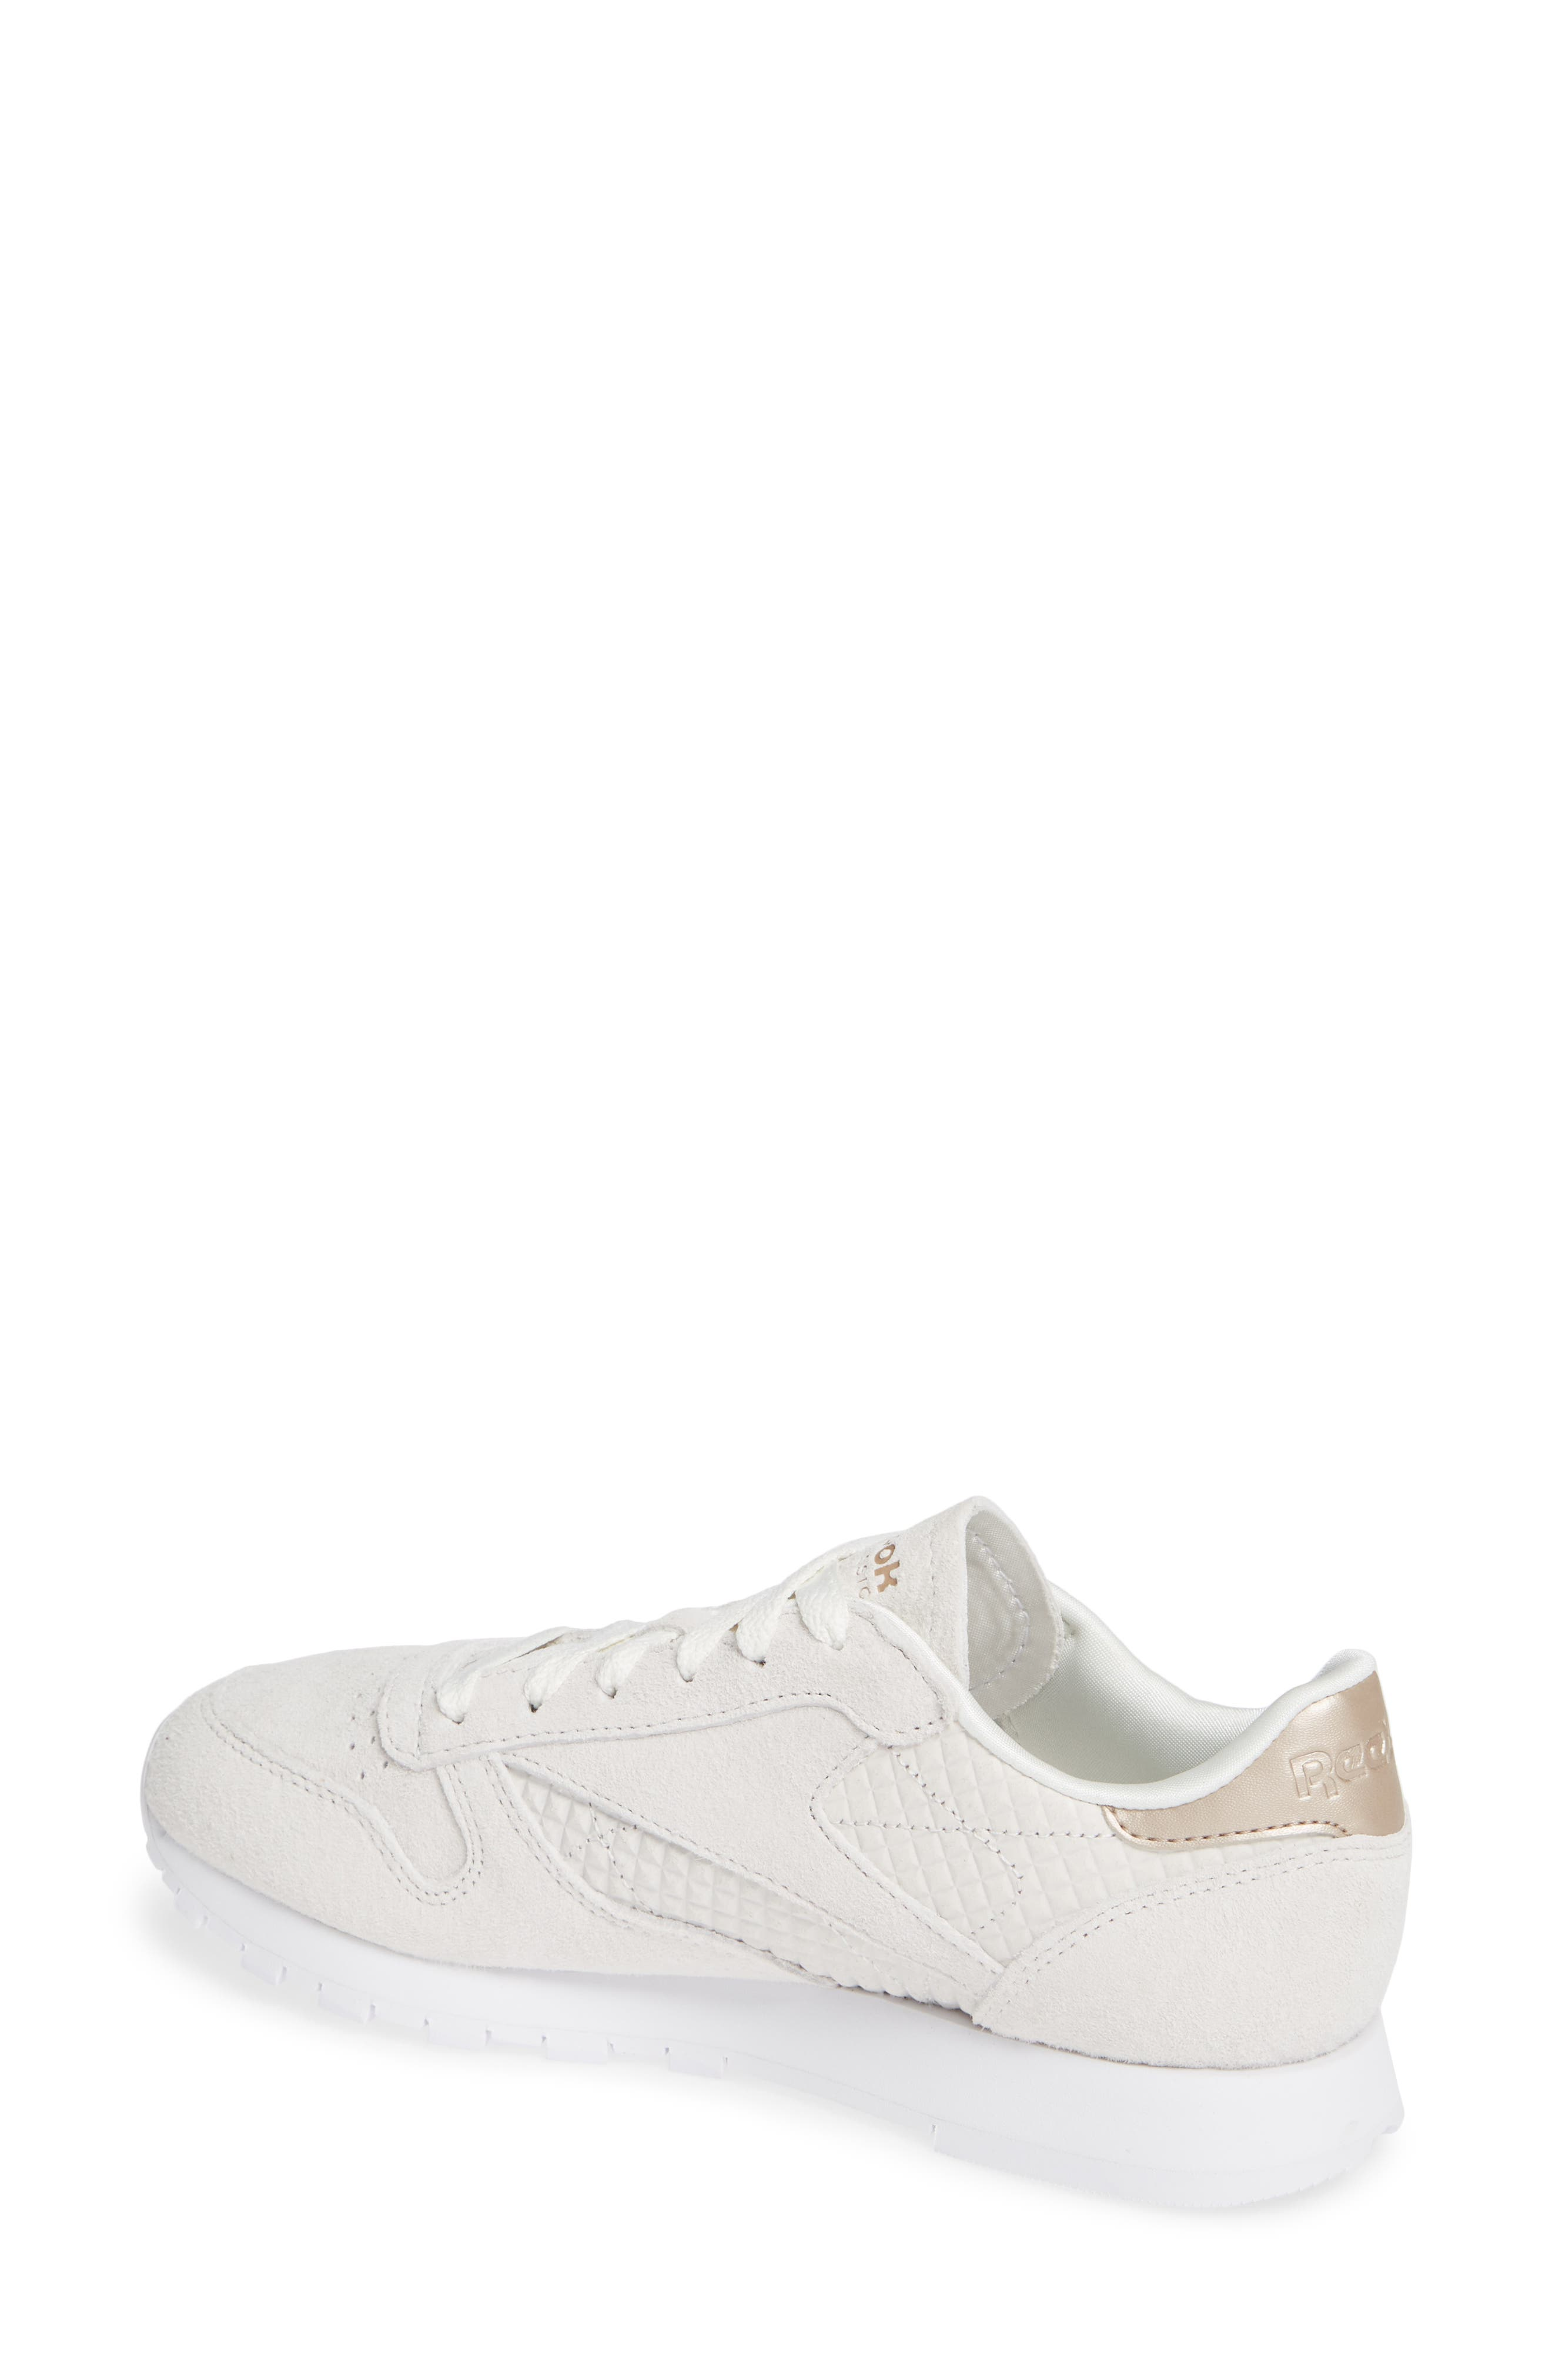 0dd402c5b08 Women s Dad Sneaker Sneakers   Running Shoes